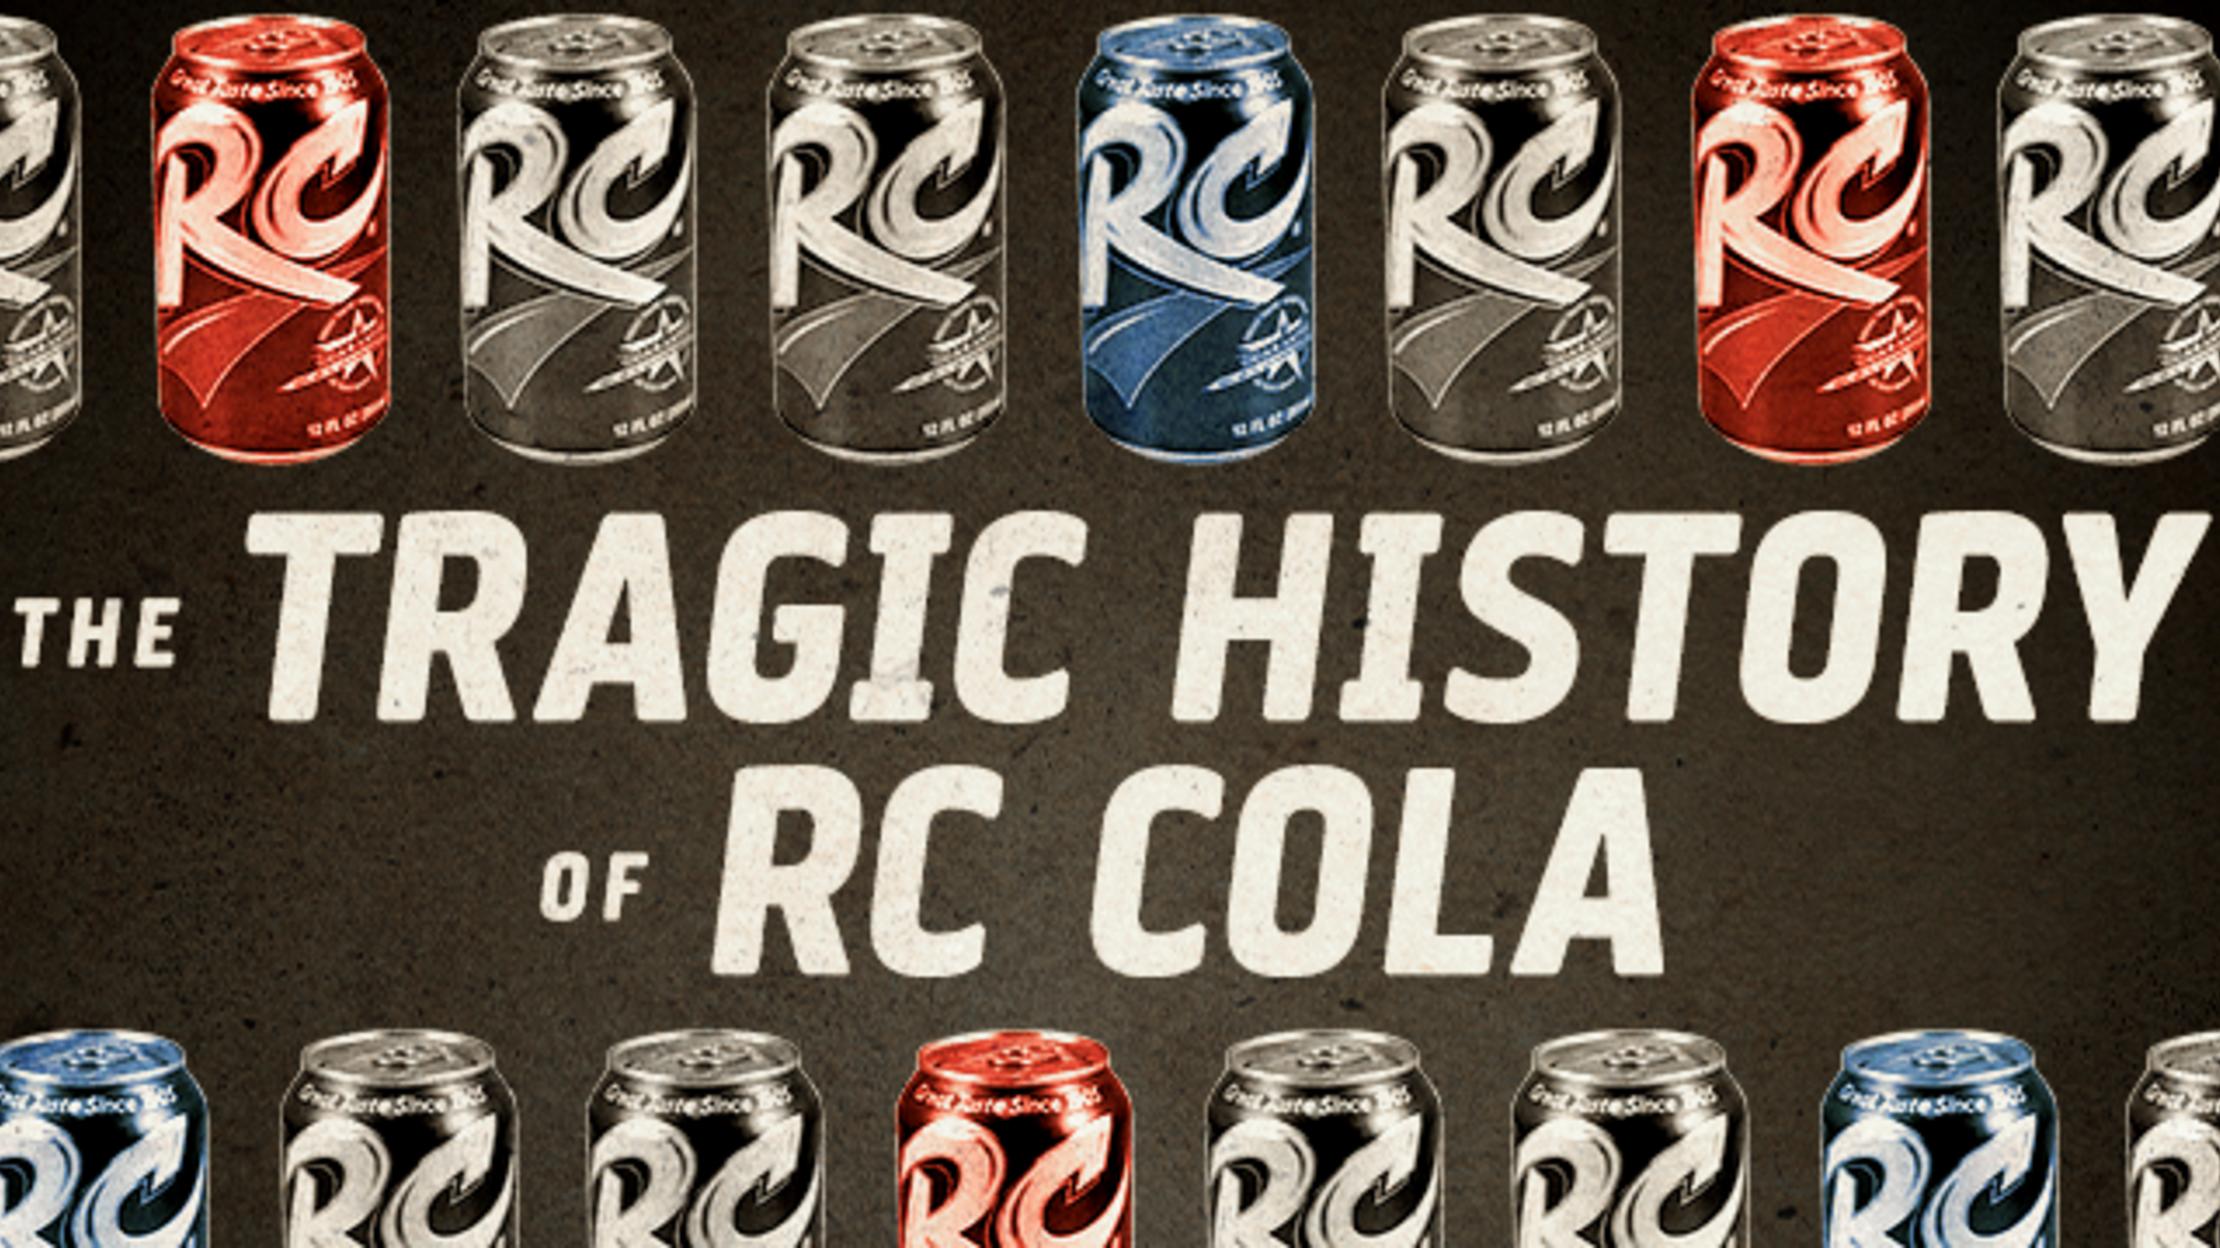 ca4bf25f994ad The Tragic History of RC Cola   Mental Floss